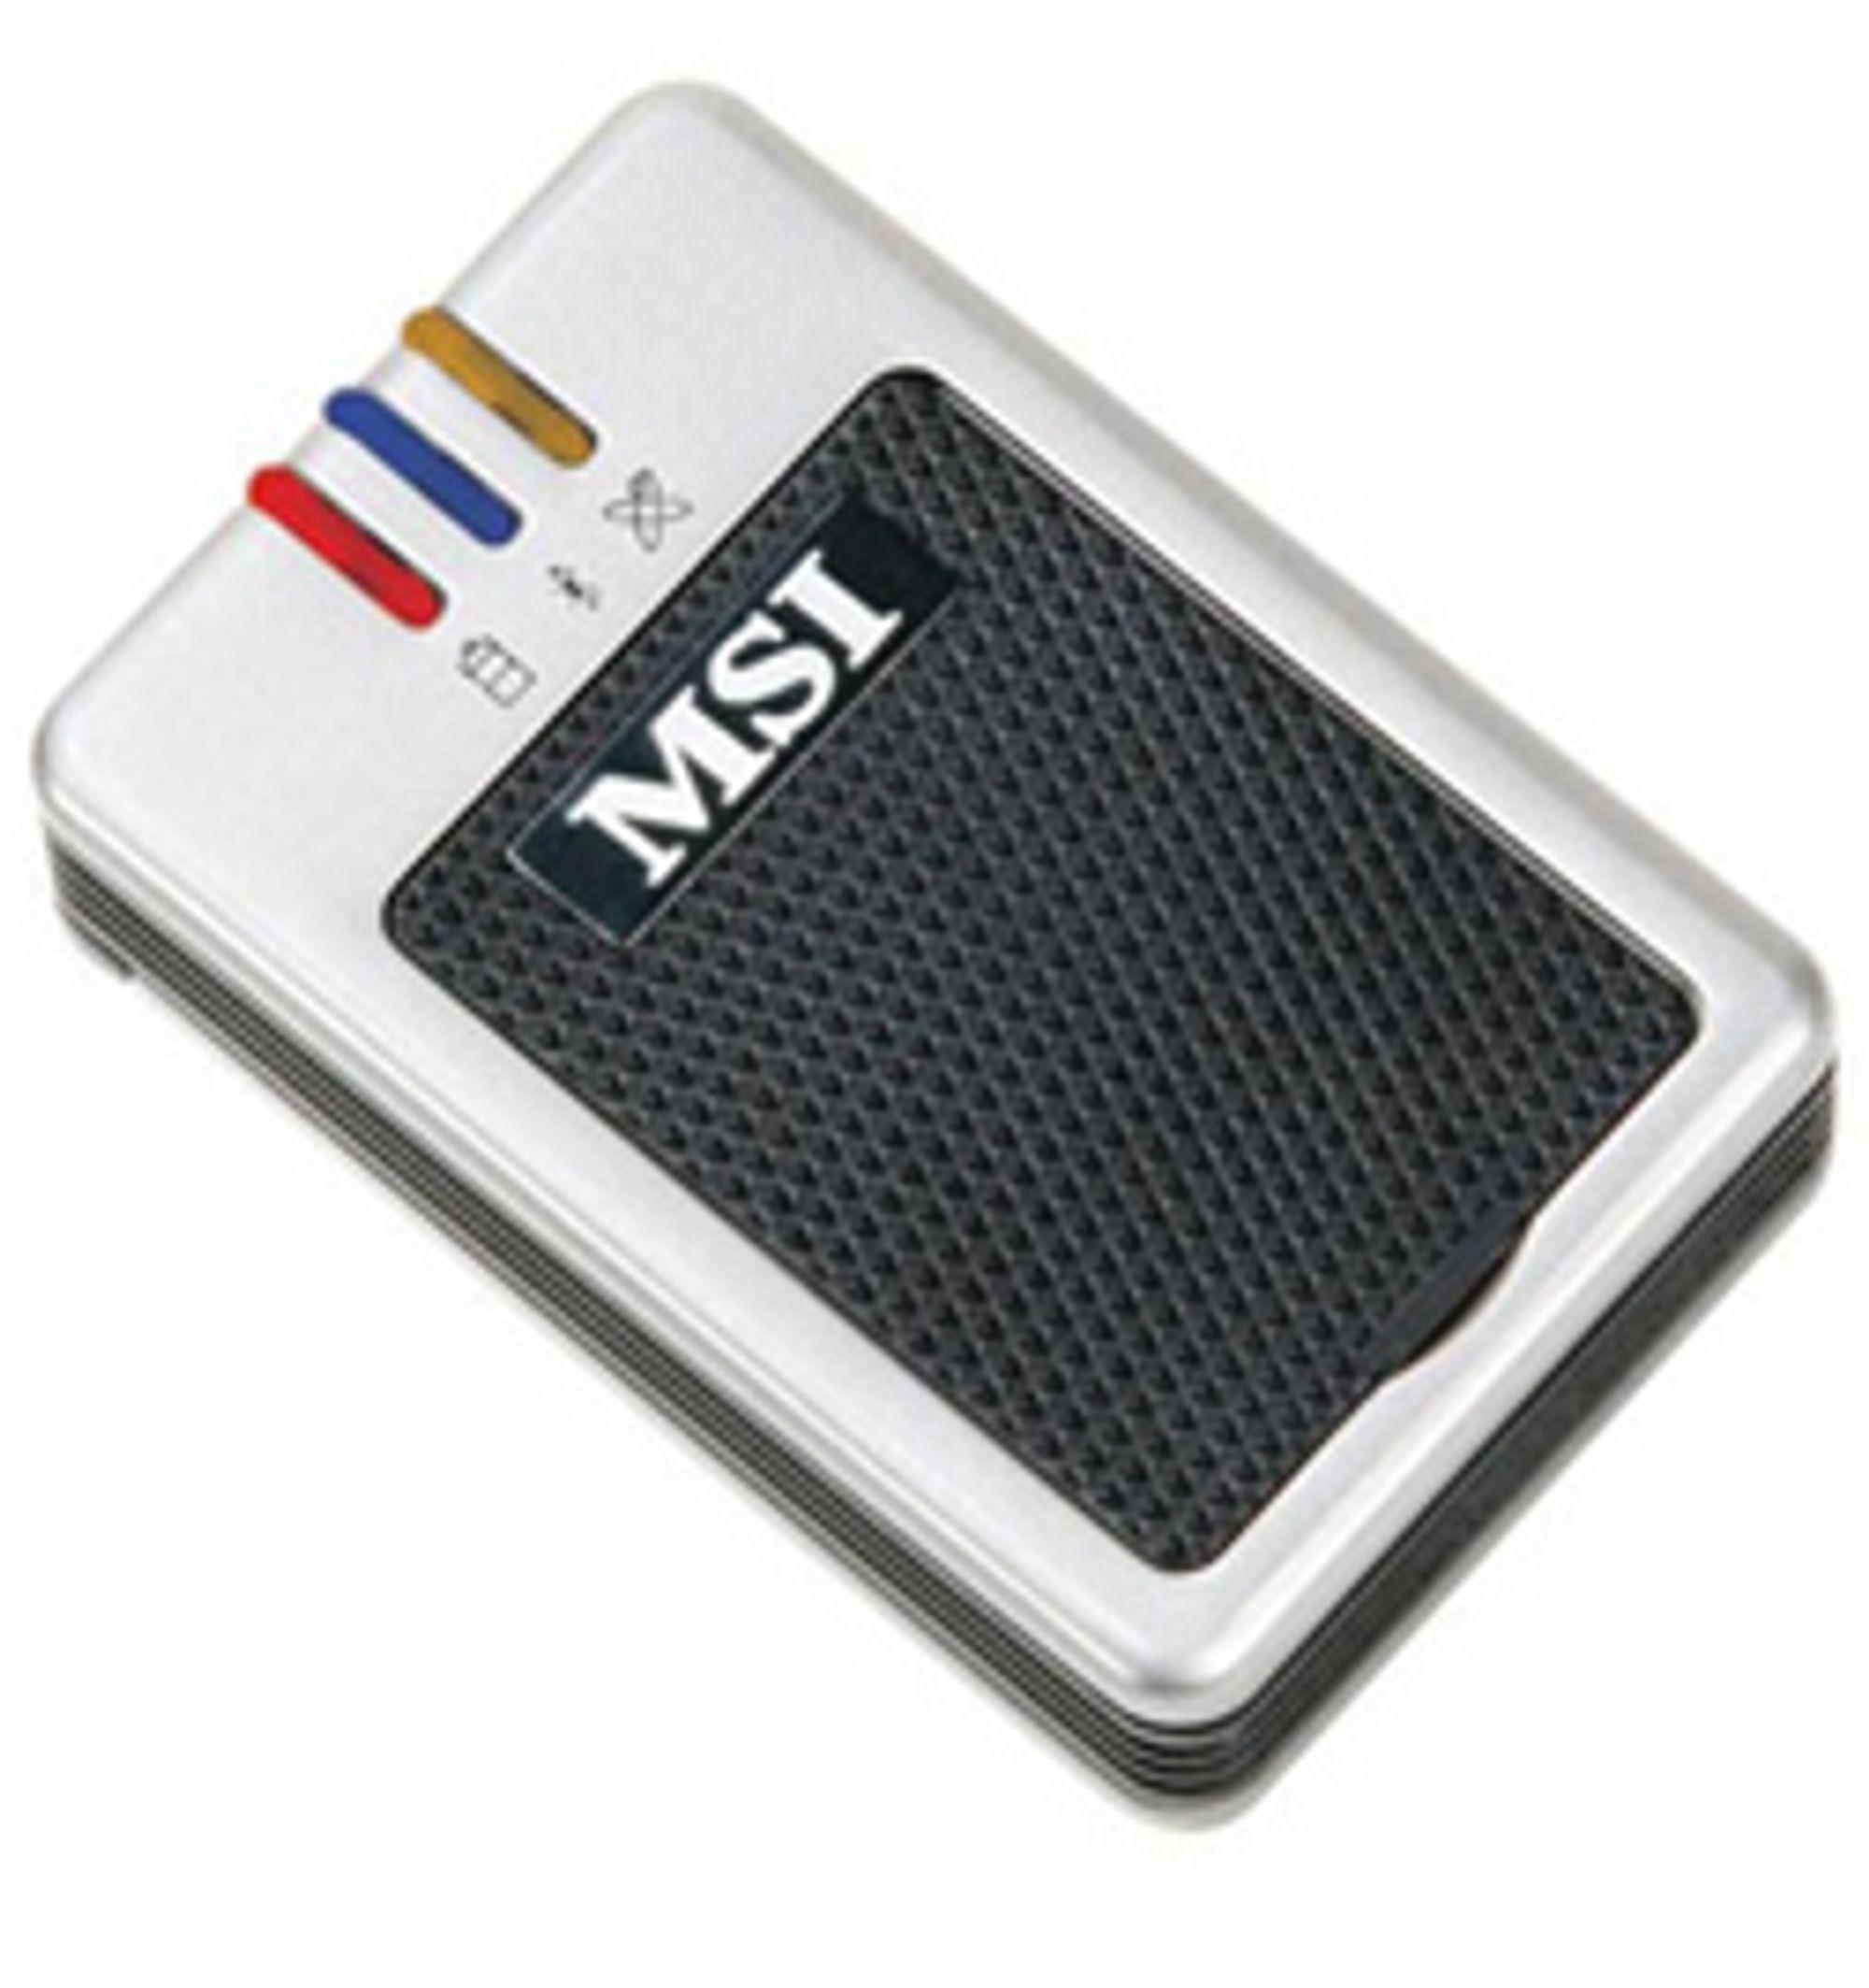 Trådløs GPS-mottaker. (Foto: MSI)